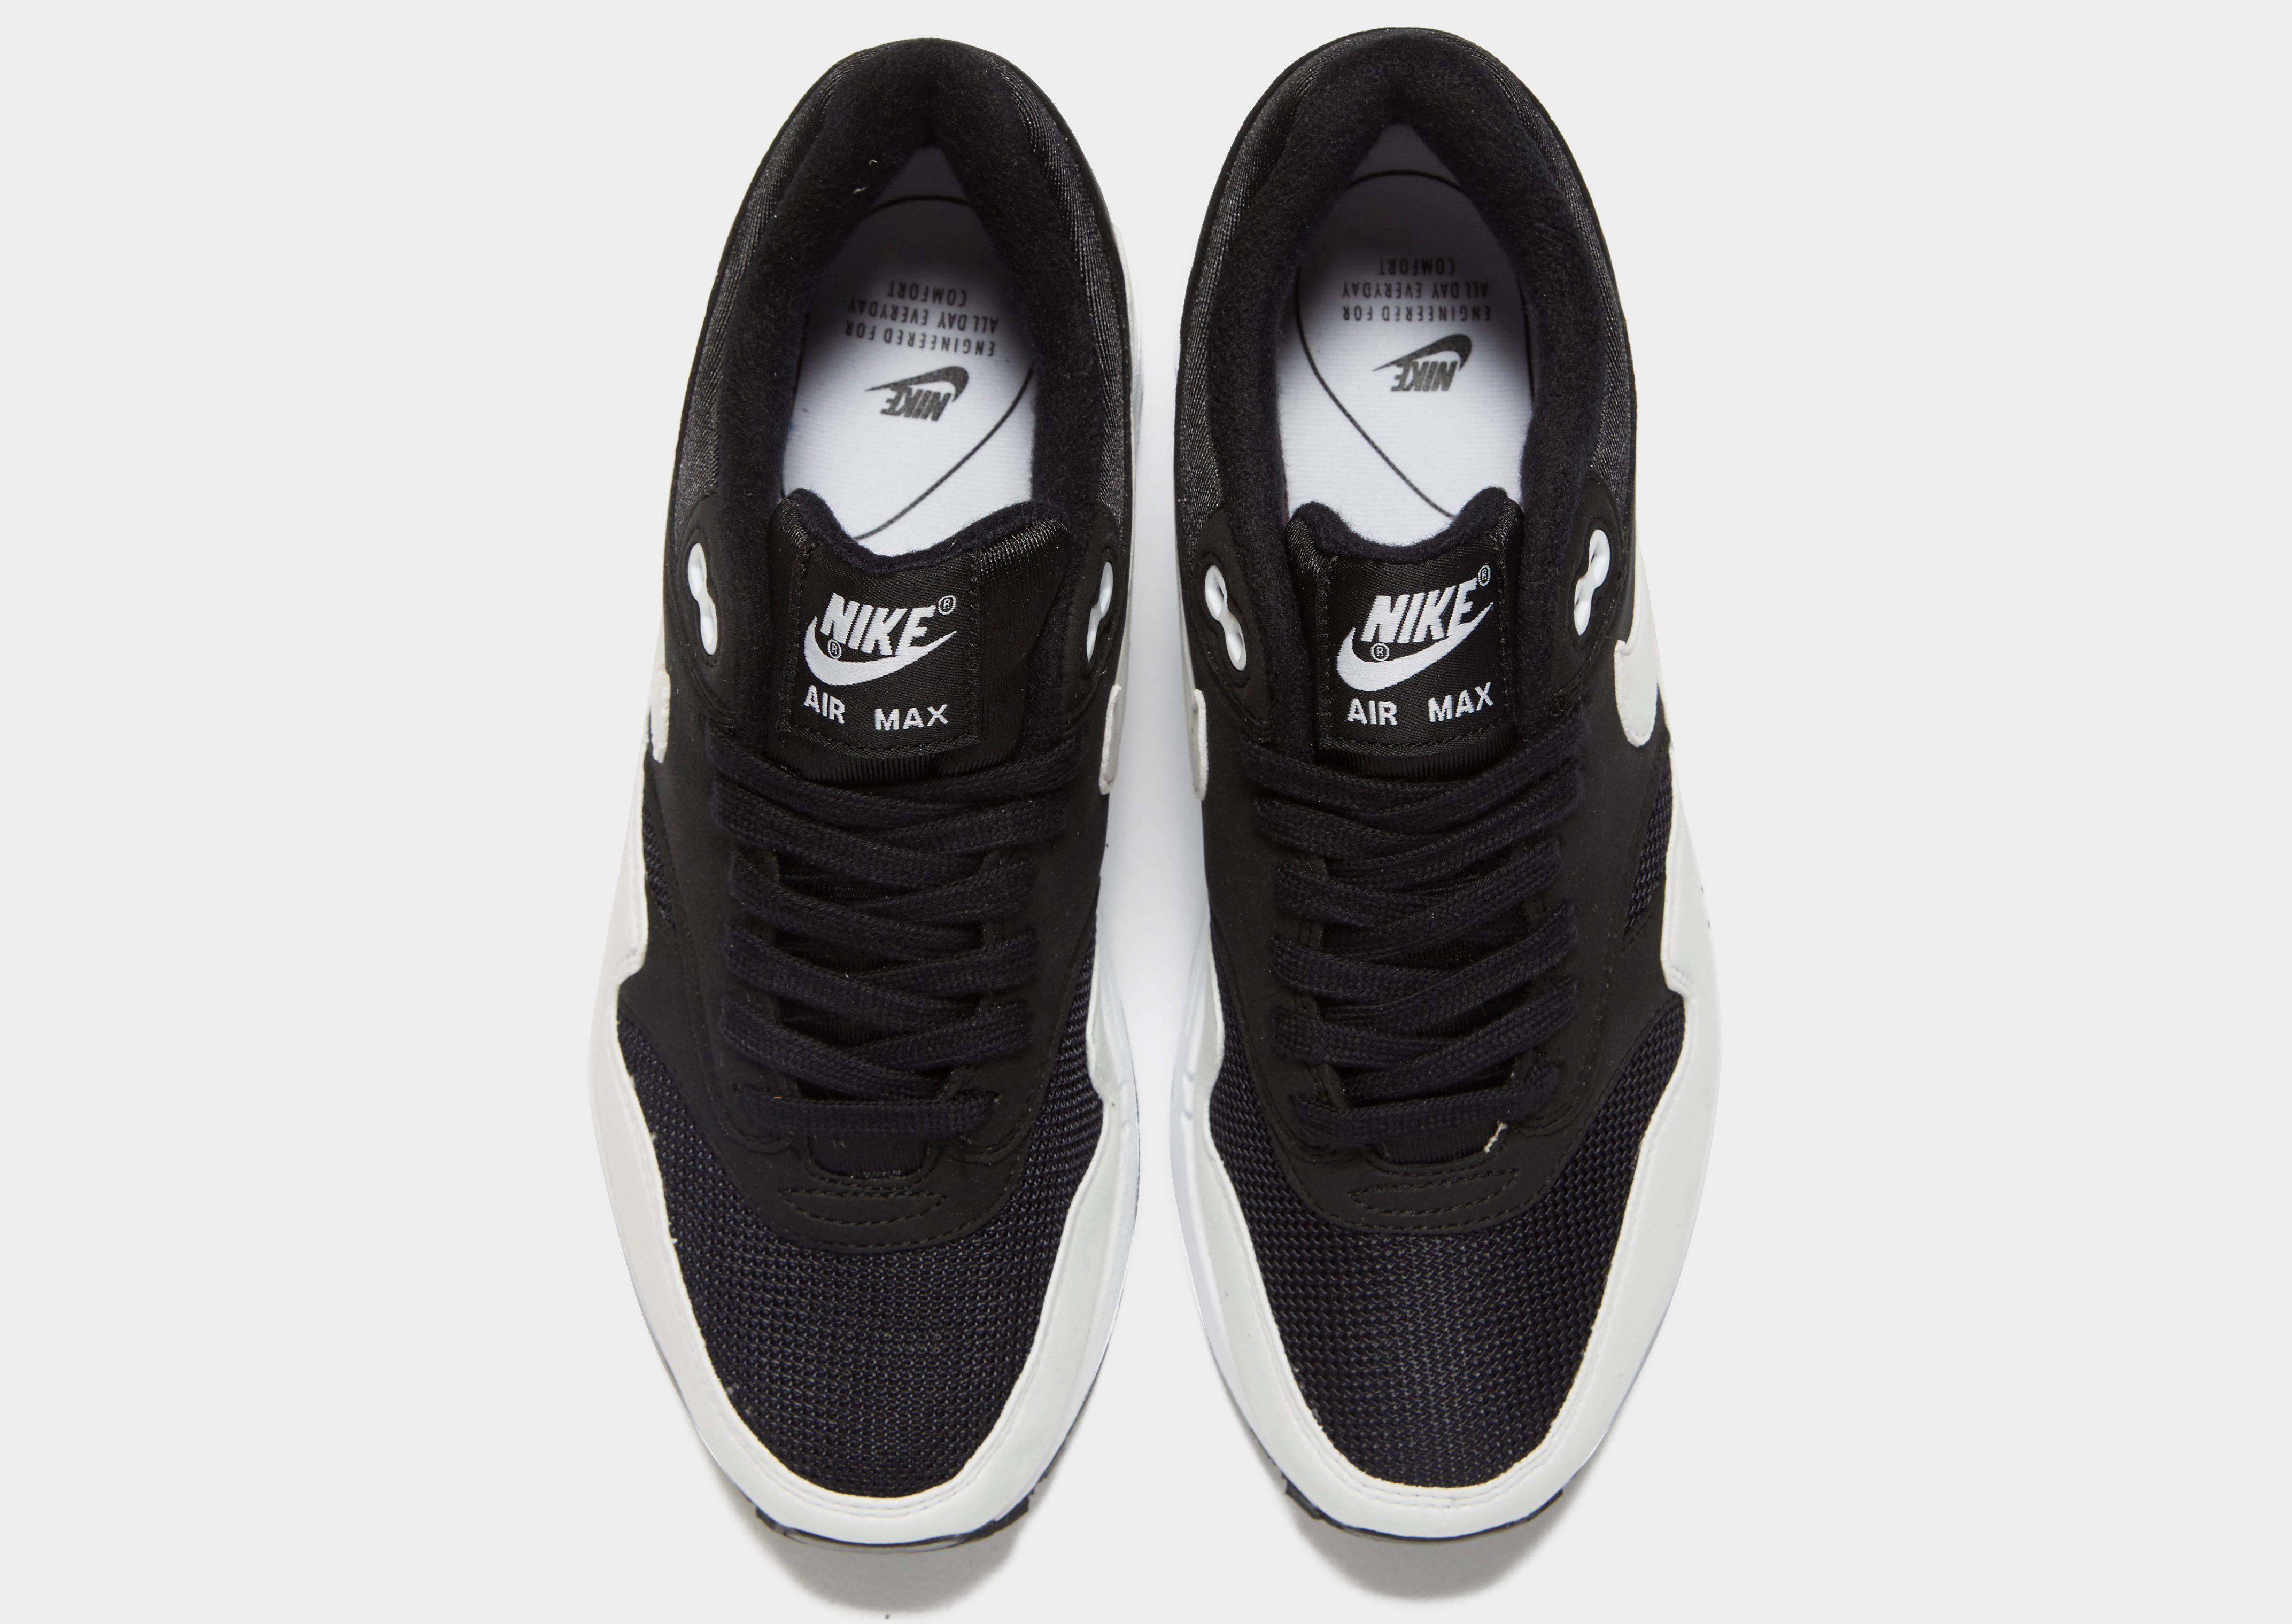 Nike Air Max 1 Damen Schwarz Outlet Großer Verkauf sqRgZ